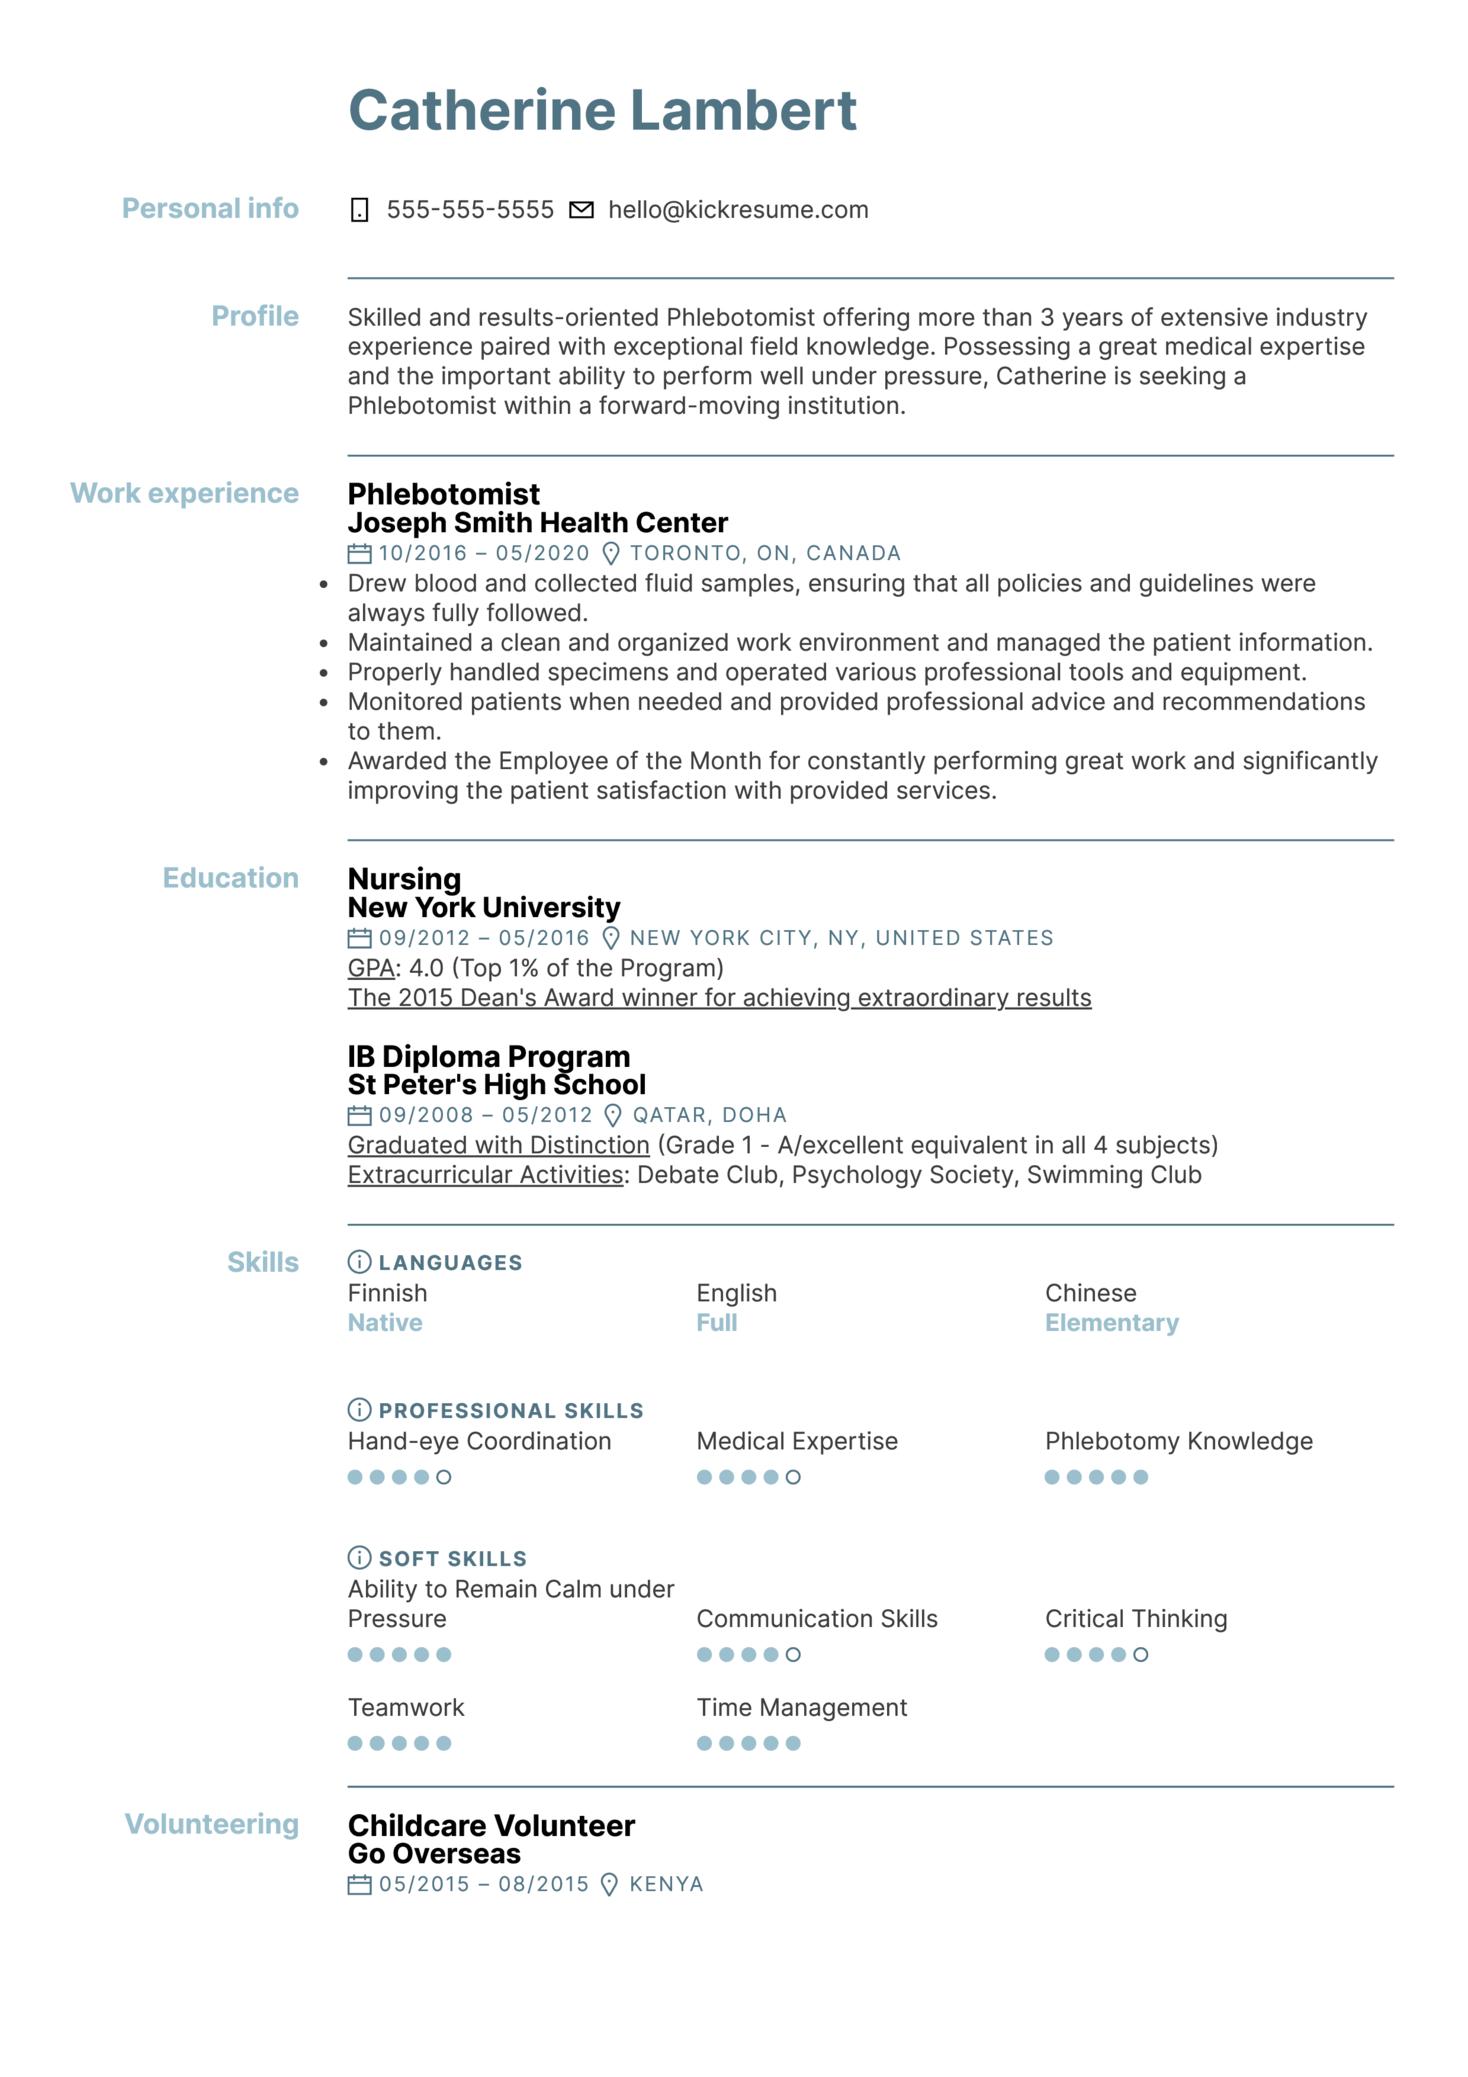 Phlebotomist Resume Example (Part 1)